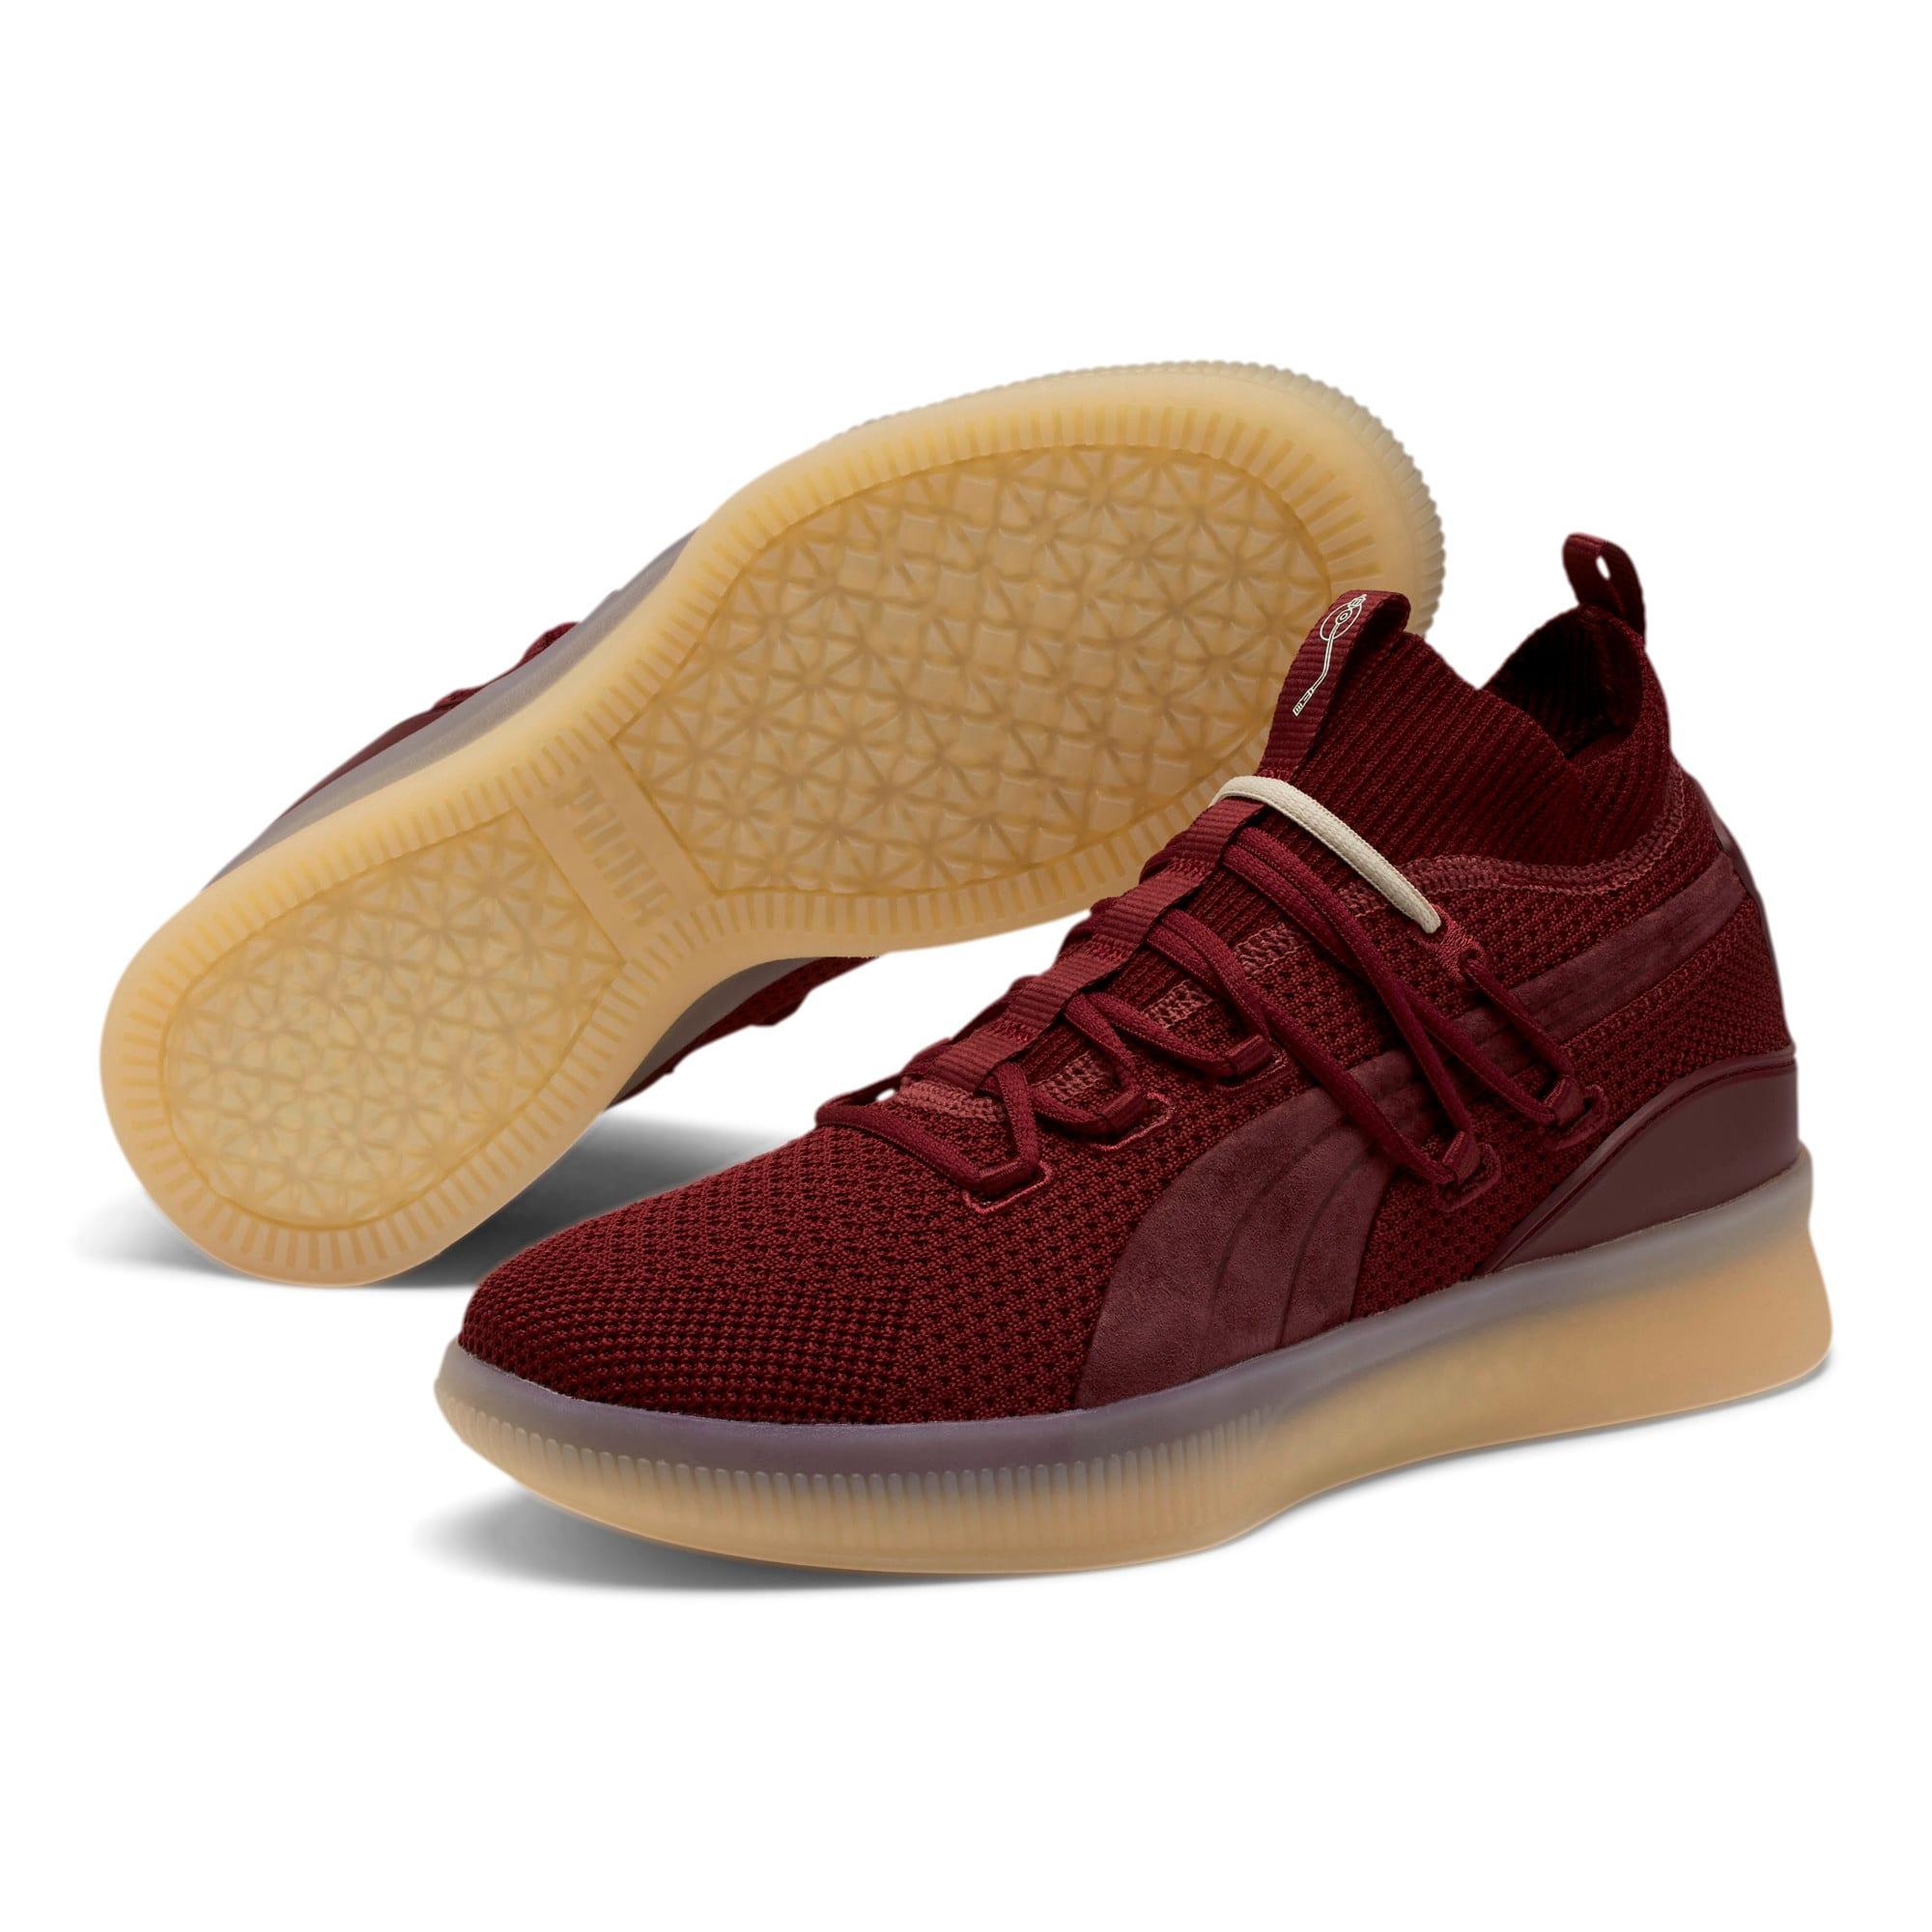 Thumbnail 2 of Clyde Court Def Jam Basketball Shoes, Cordovan, medium